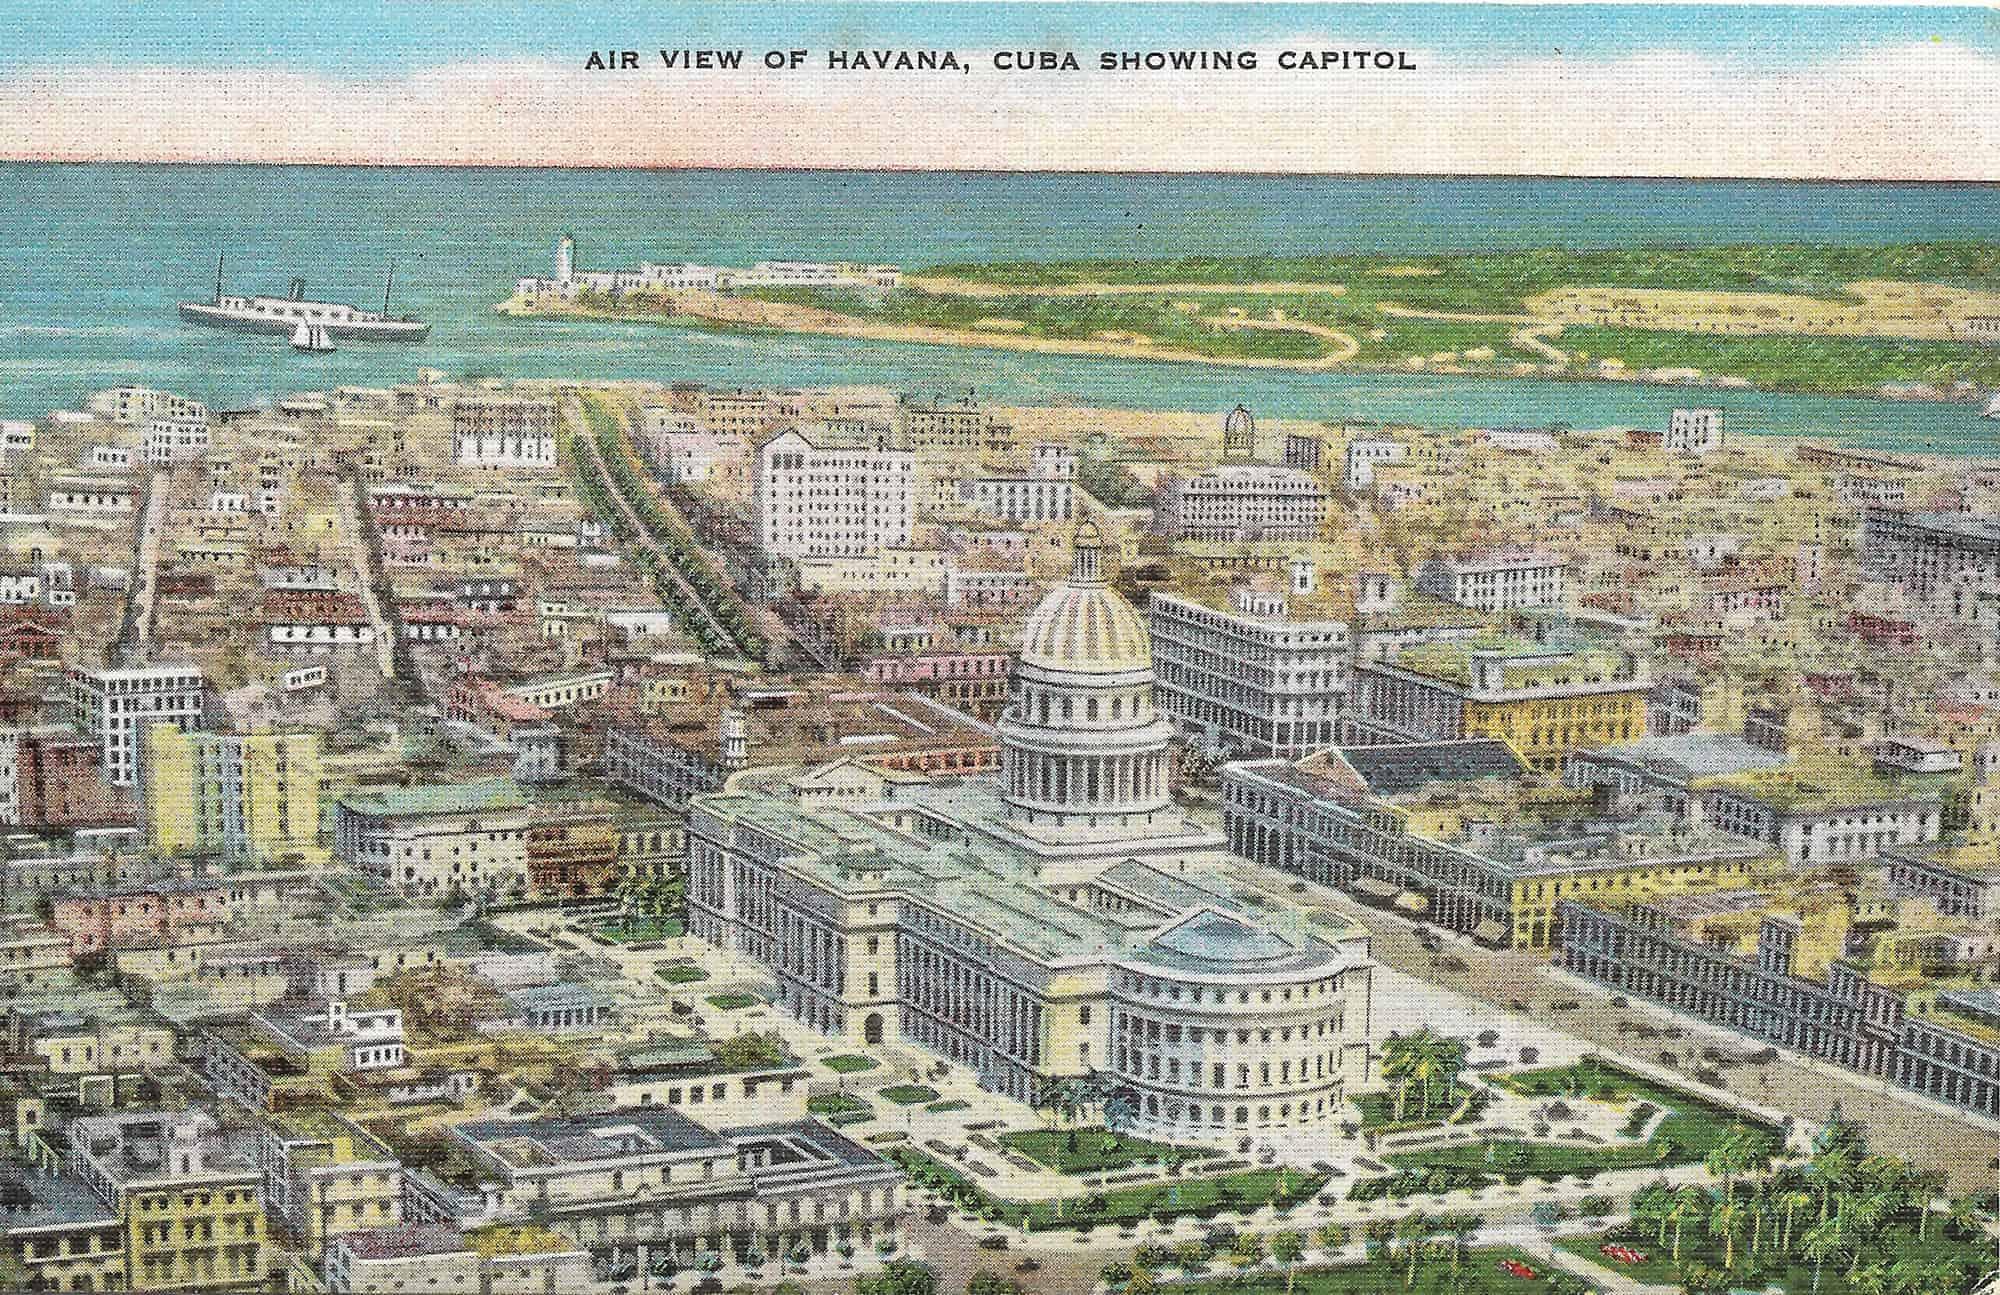 Cuba's Capital in Havana